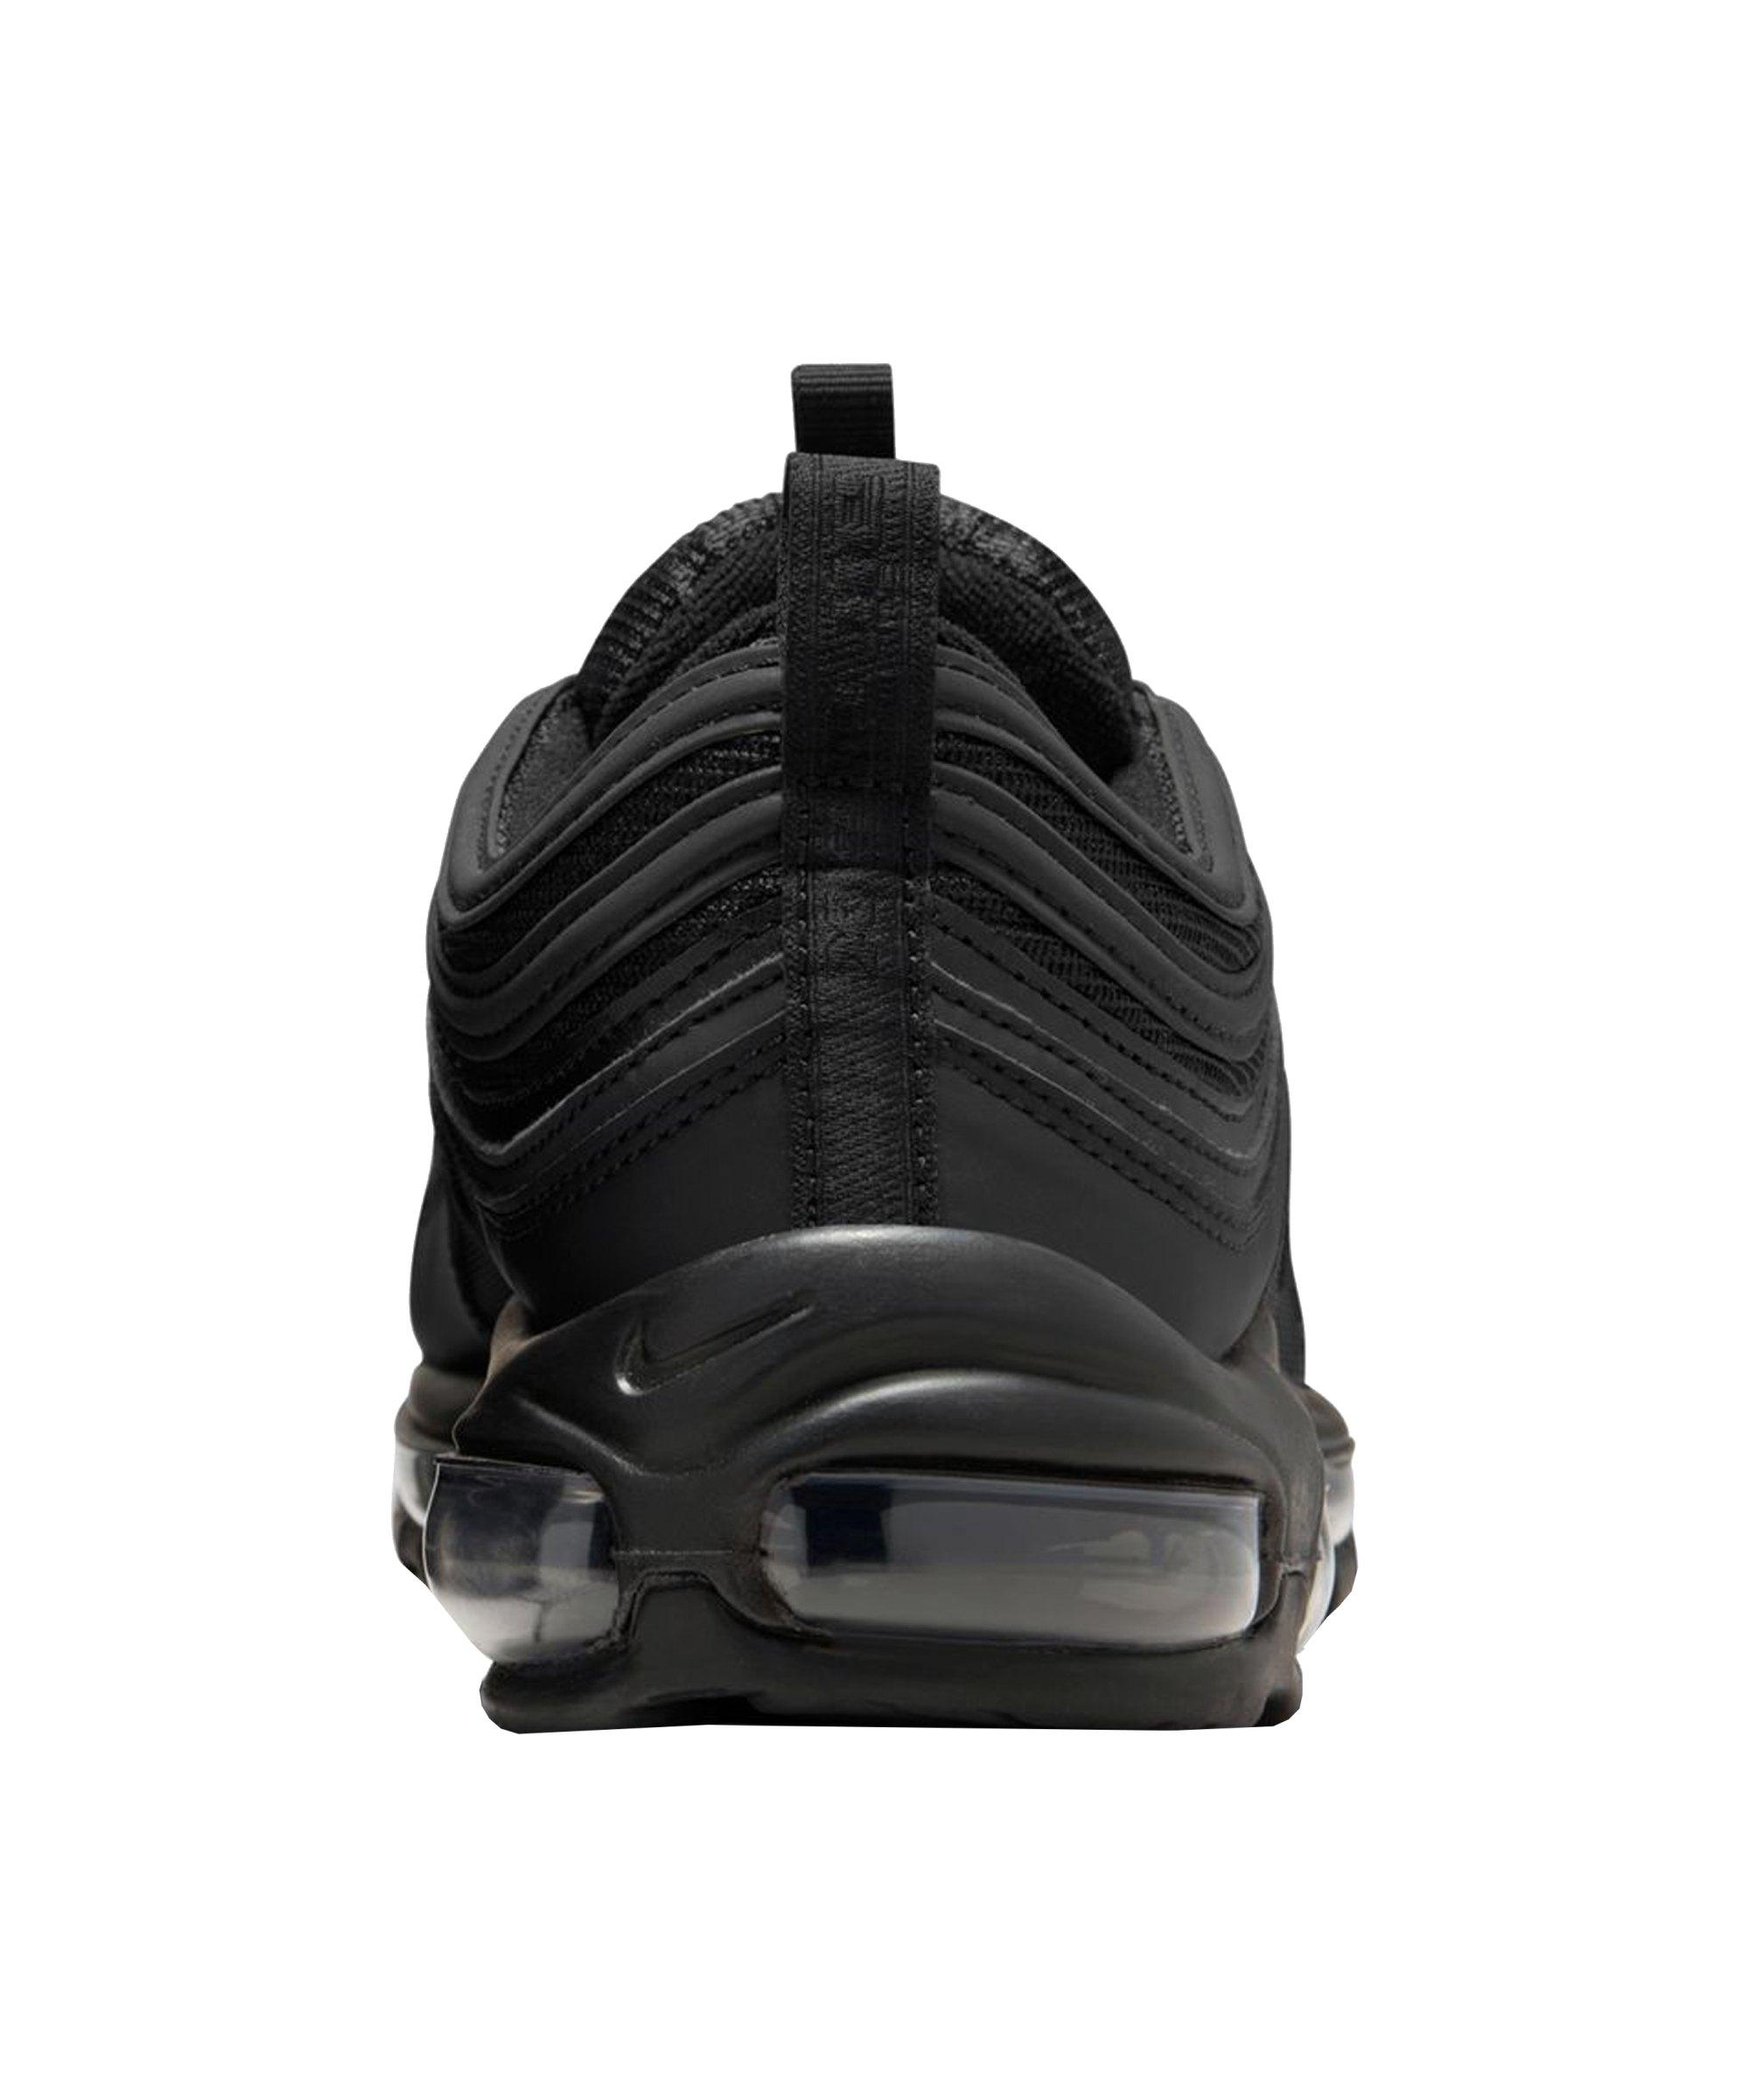 Nike Air Max 97 Sneaker Schwarz Weiss F001